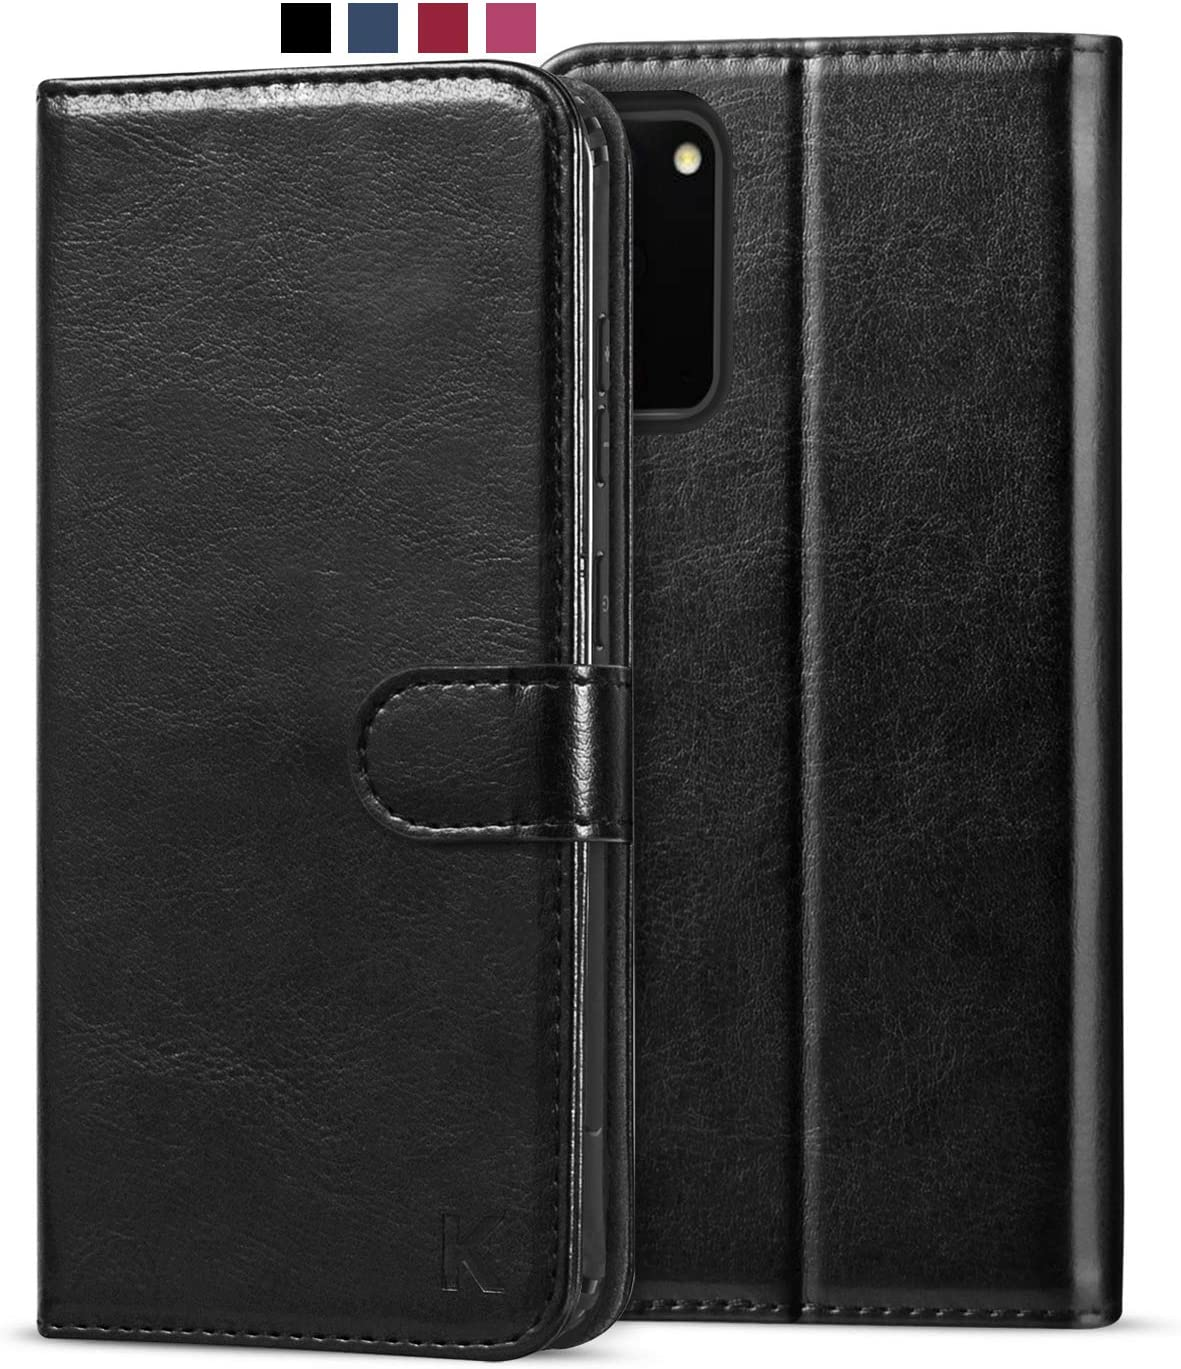 KILINO Samsung Galaxy S20 Wallet Case [PU Leather] [Soft TPU] [RFID Blocking] [Shock-Absorbent Bumper] [Card Slots] [Kickstand] [Magnetic Closure] Flip Folio Cover for Samsung Galaxy S20 5G (Black)